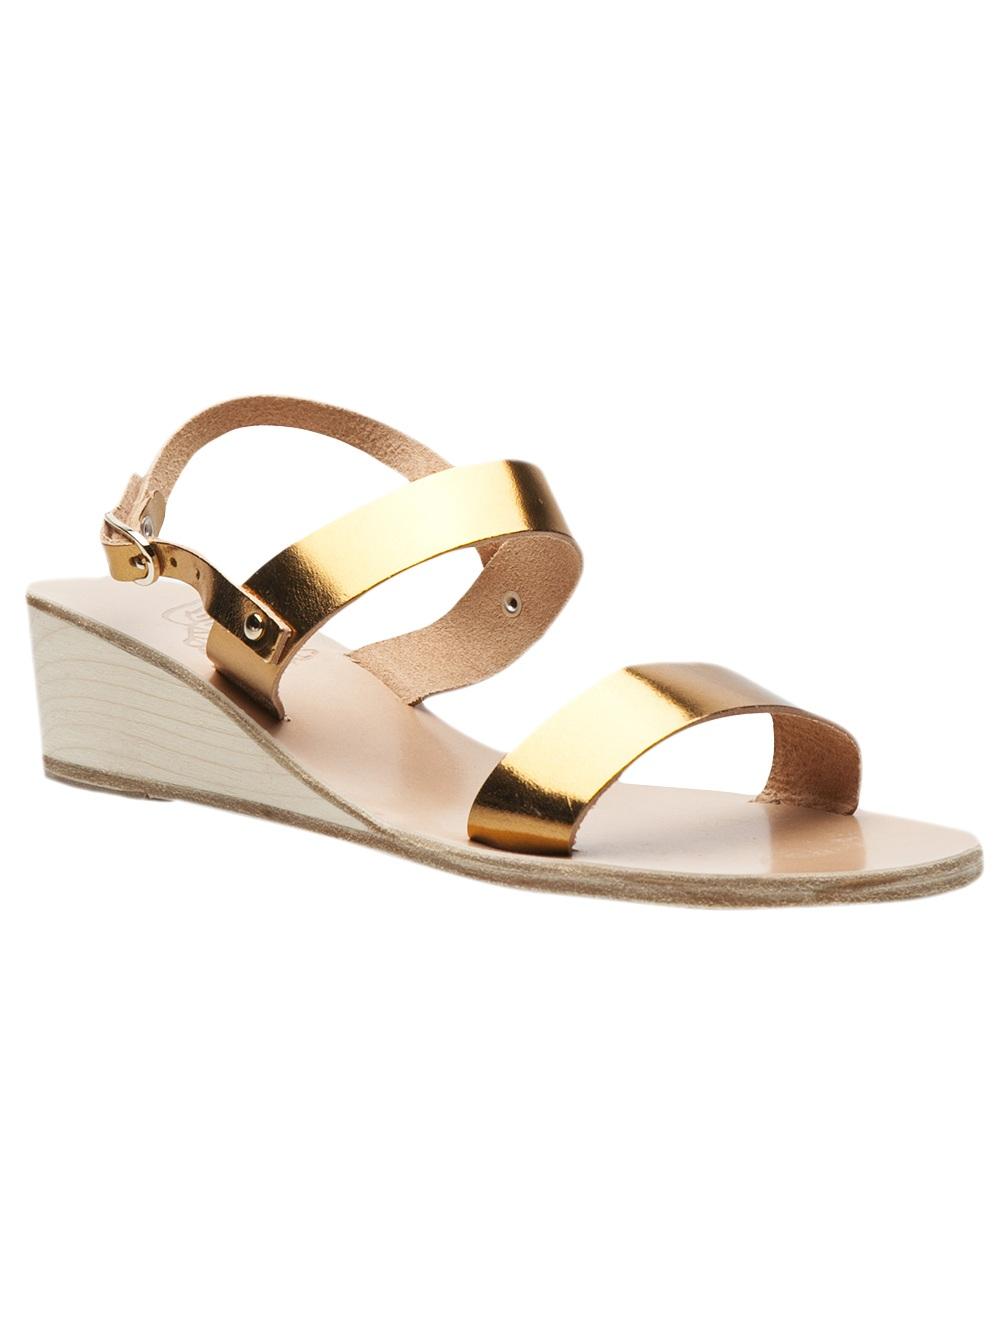 96a782f819a0 Lyst - Ancient Greek Sandals Clio Wedge Sandal in Metallic